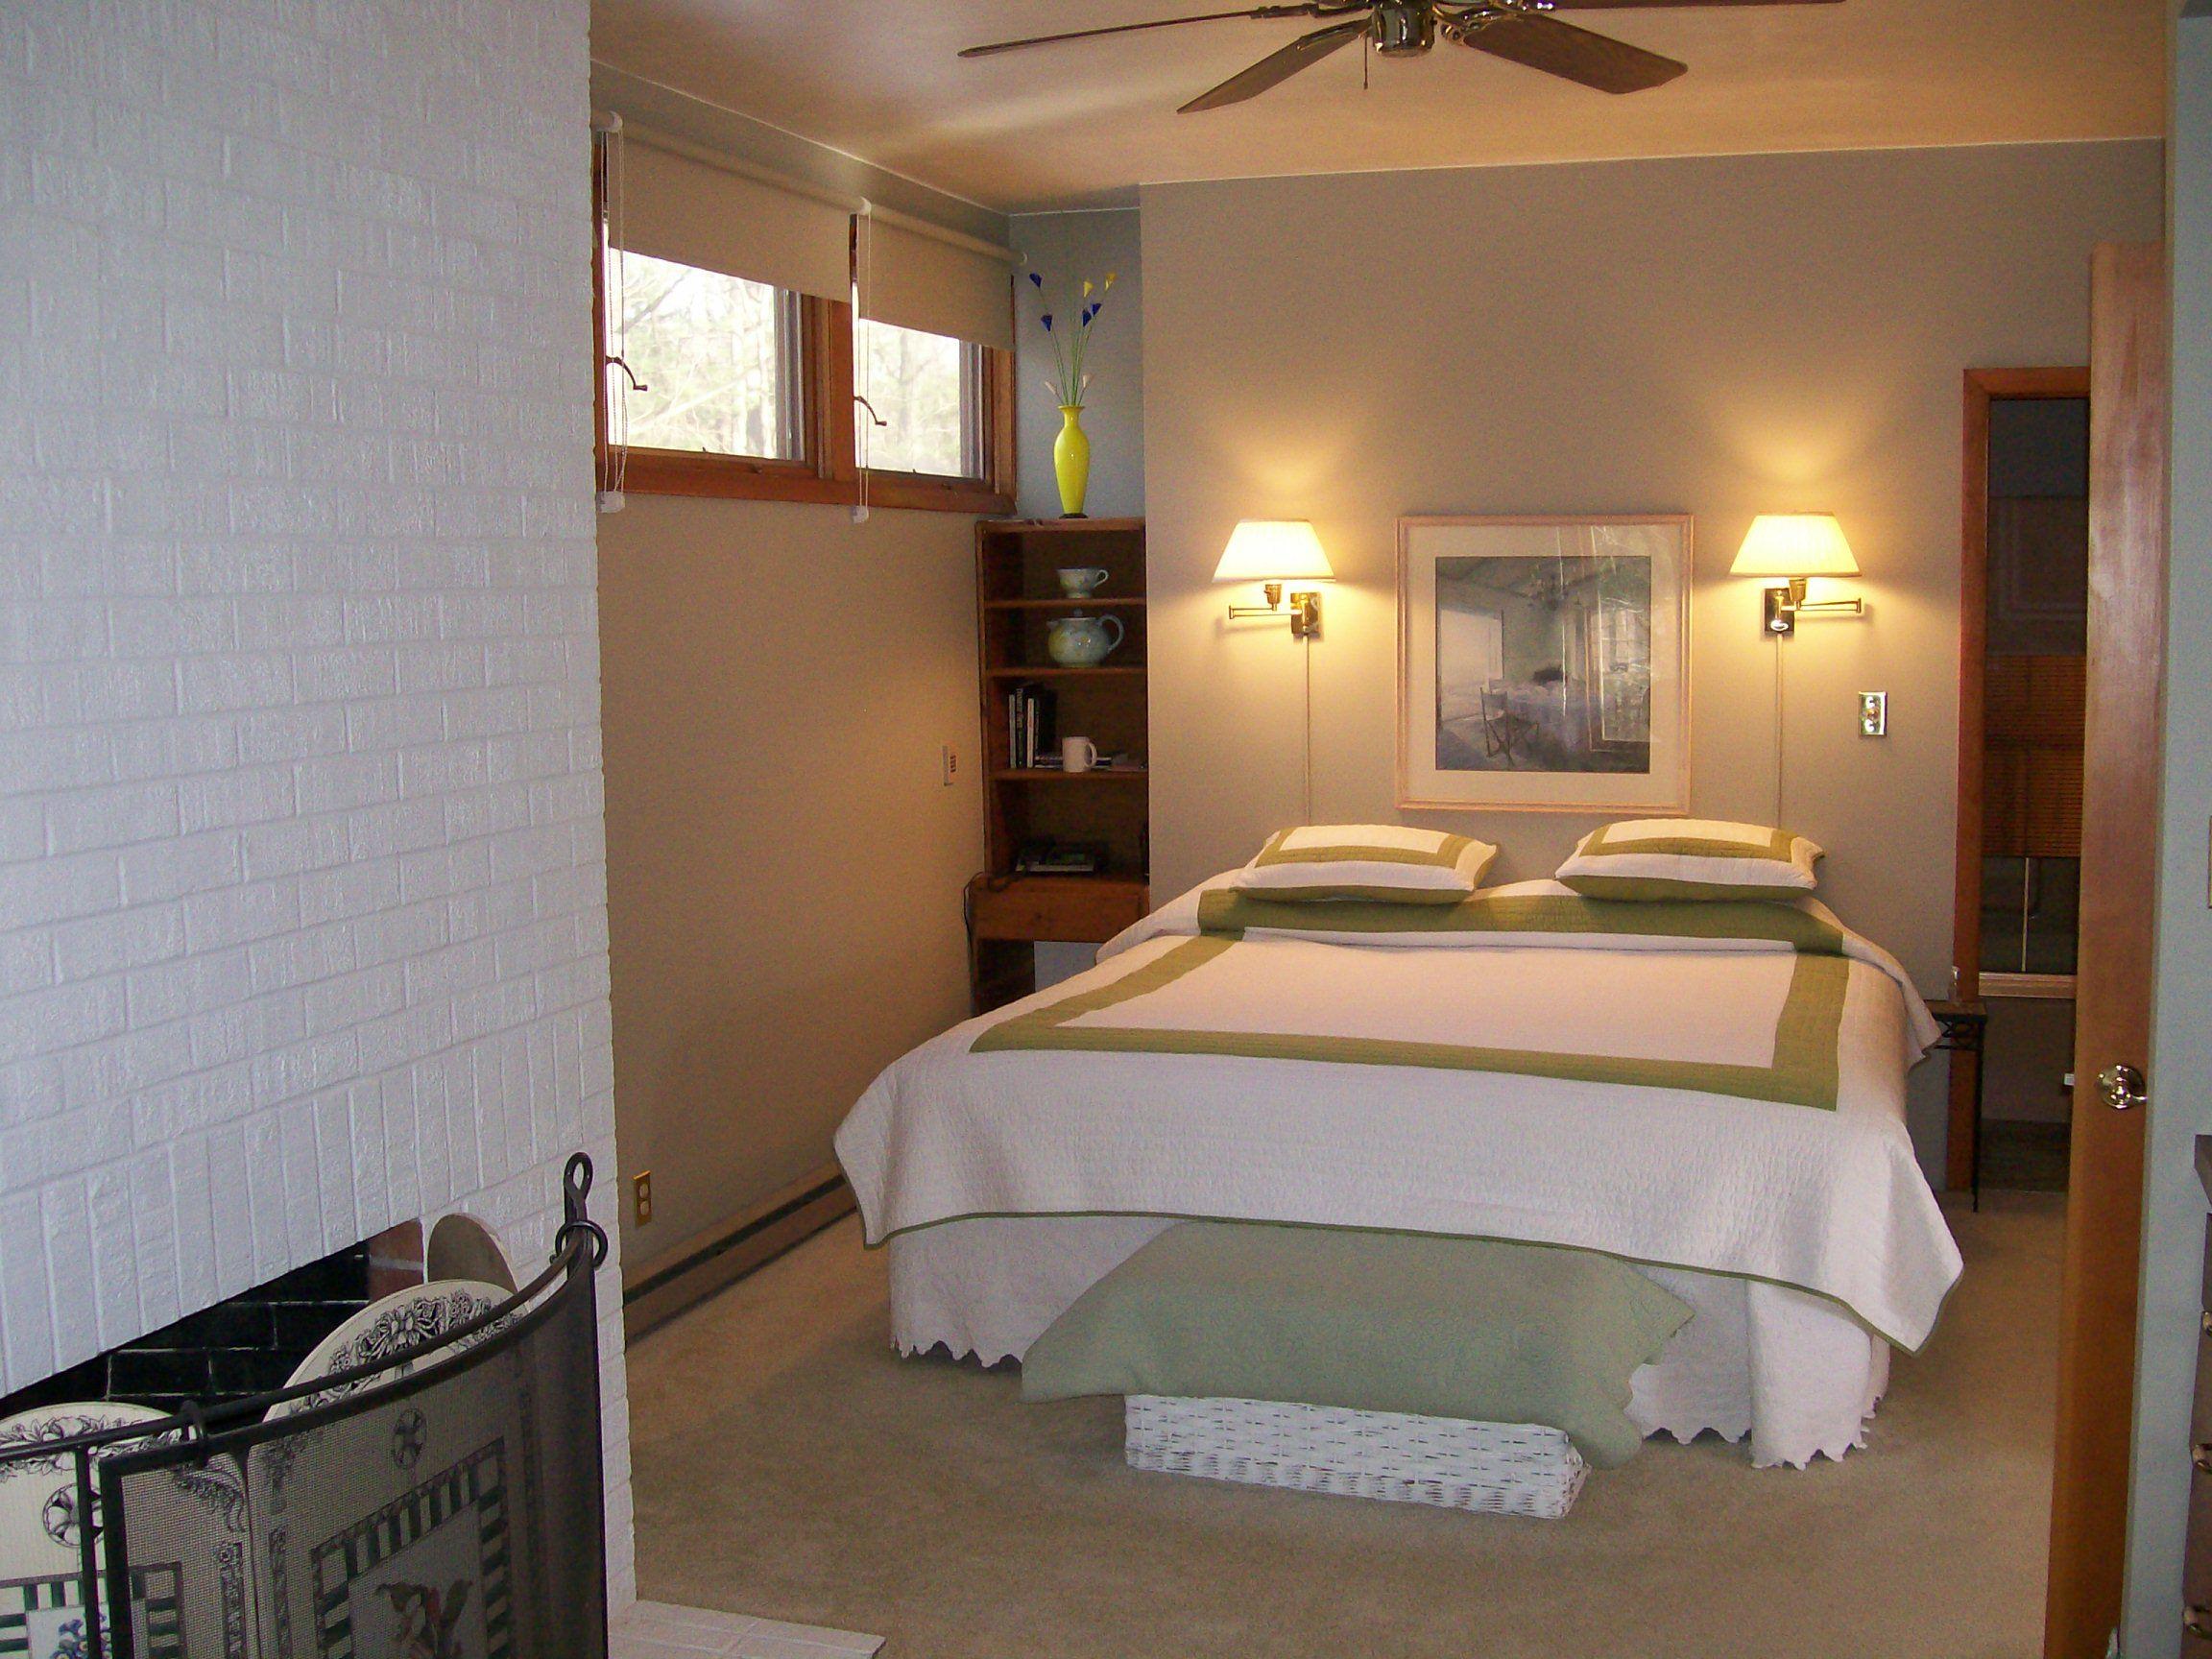 cozy bedroom setups  bedroom setup home decor cozy bedroom